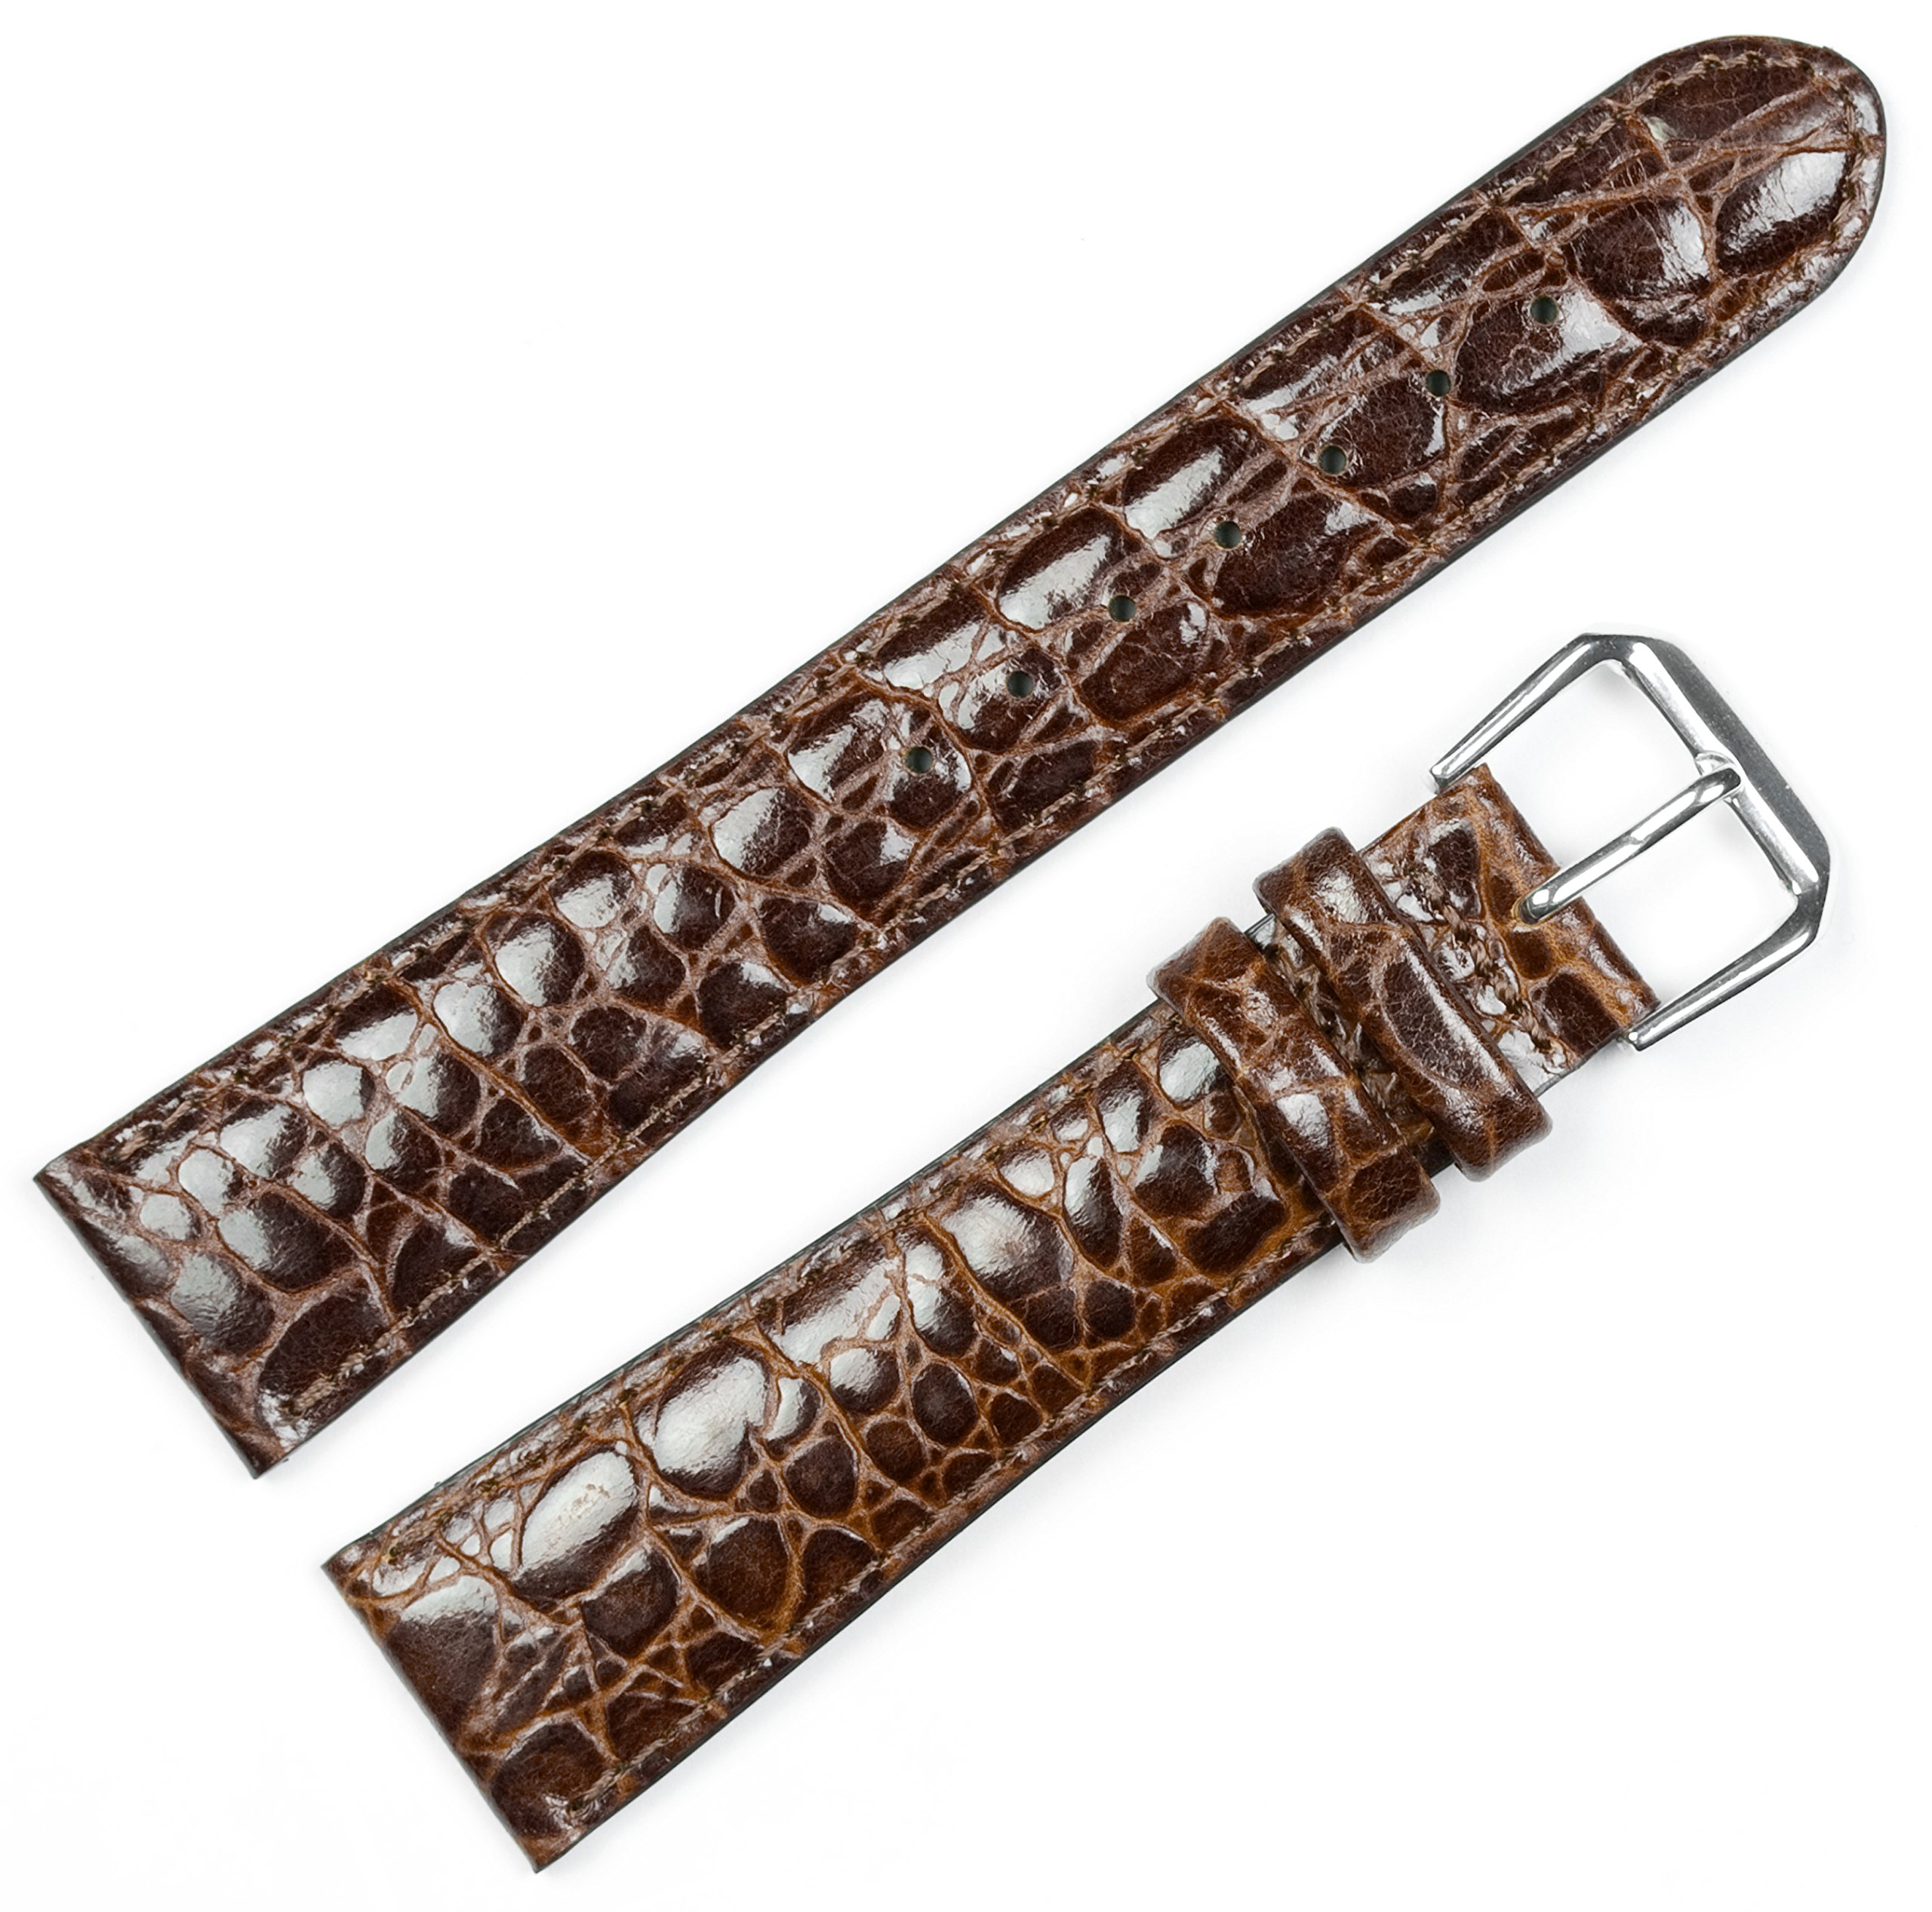 Alligator Grain Watchband - Brown 16MM (Extra Long)